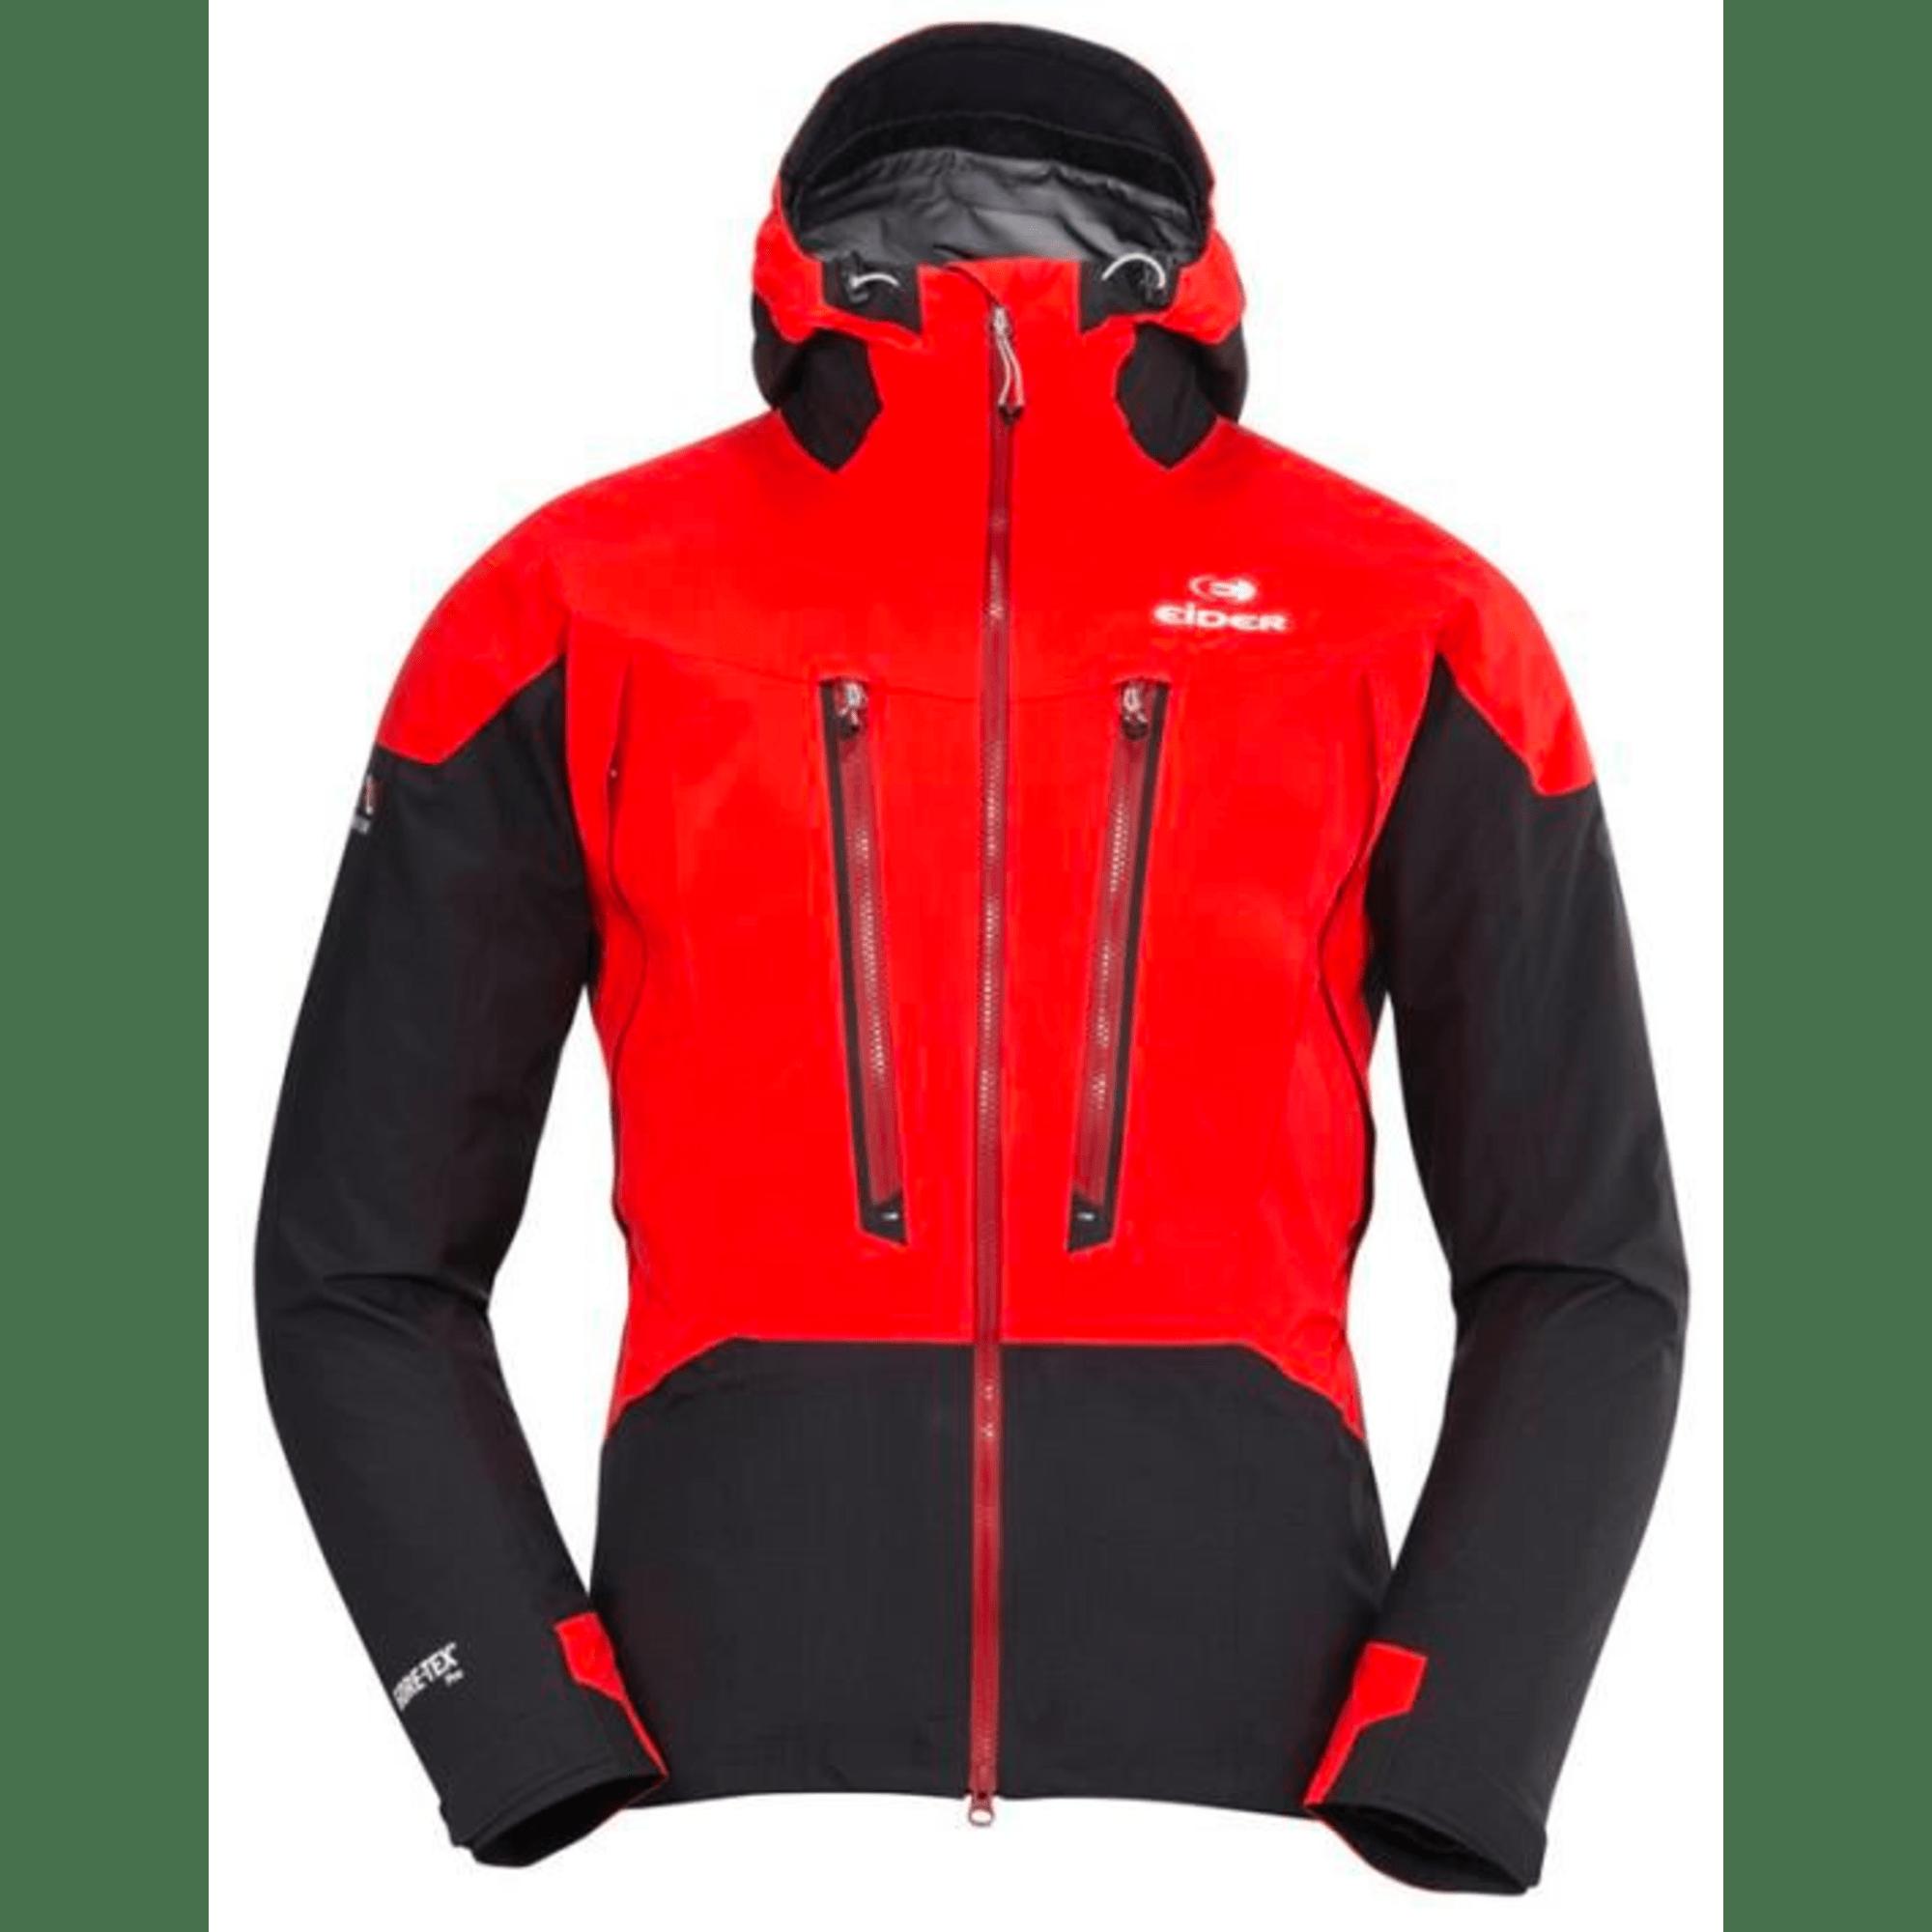 Blouson de ski EIDER 56 (XL) noir 4250918